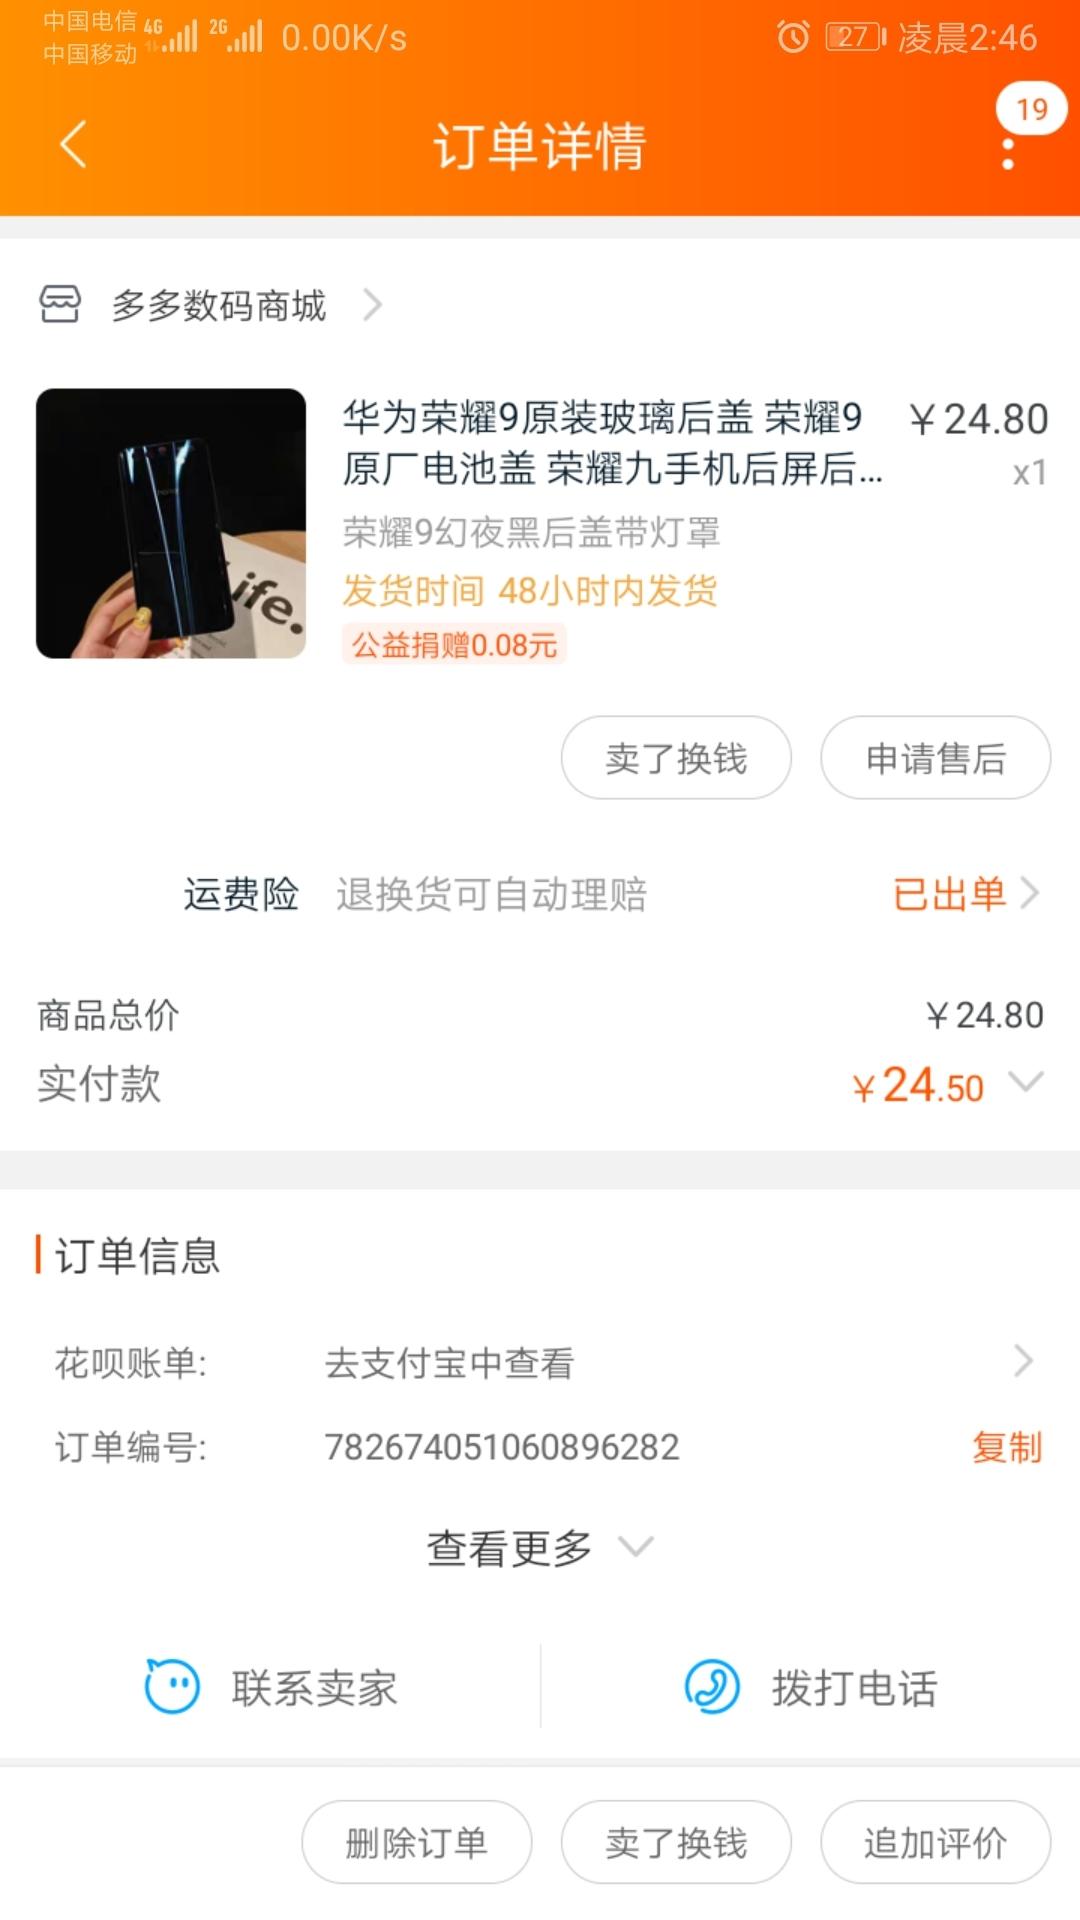 Screenshot_20200509_024626_com.taobao.taobao.jpg